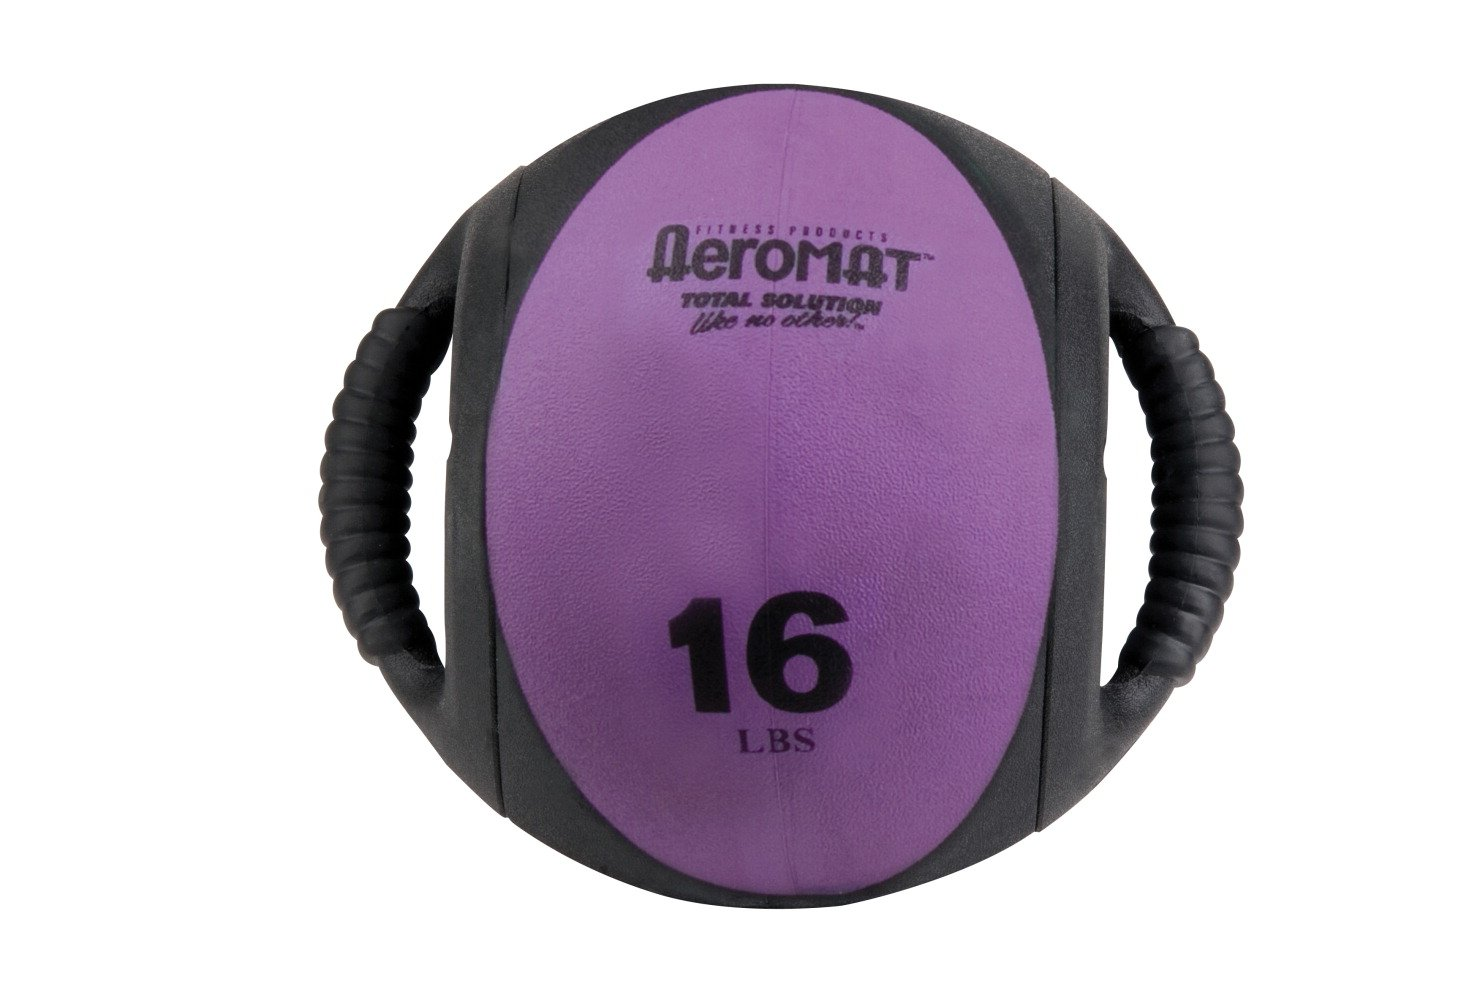 Aeromat Dual Grip Power Medicine Ball, 9cm/16-Pound, Black/Purple